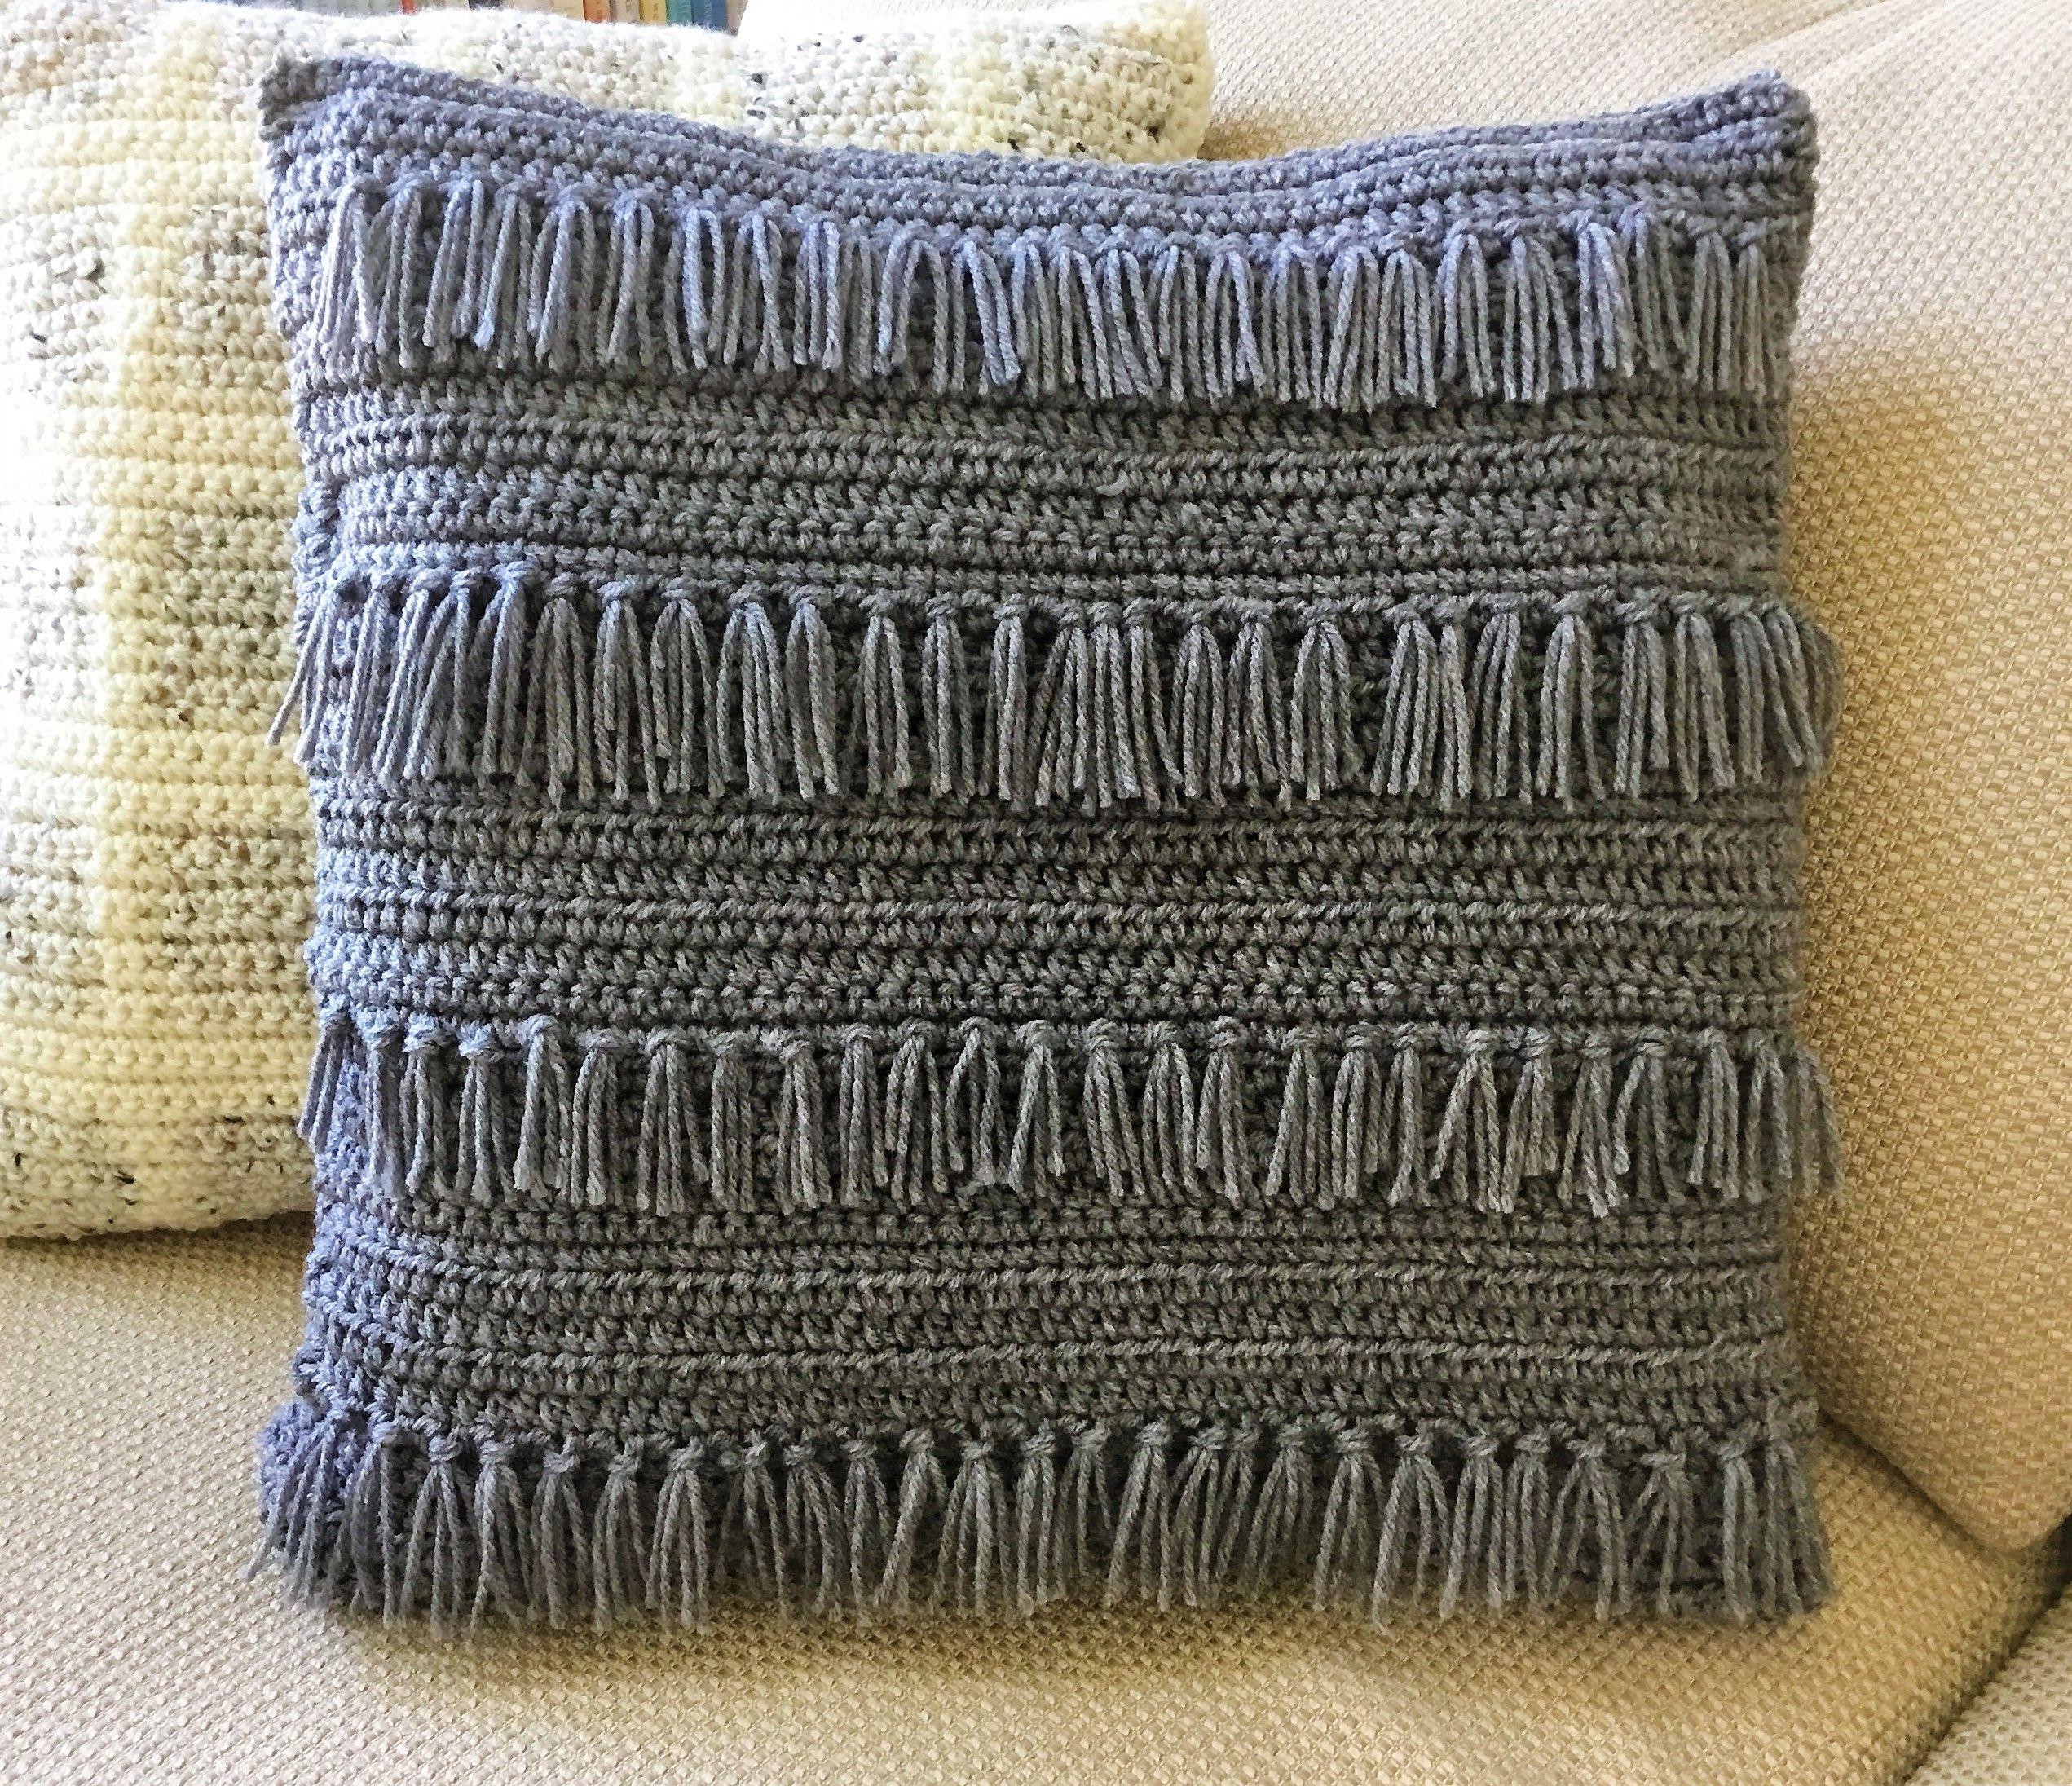 Crochet Fringe Pillow Free Crochet Pattern For This Easy Farmhouse Style Crochet Pillow Case Pattern Pillow Cover Crochet Pattern Crochet Pillow Patterns Free